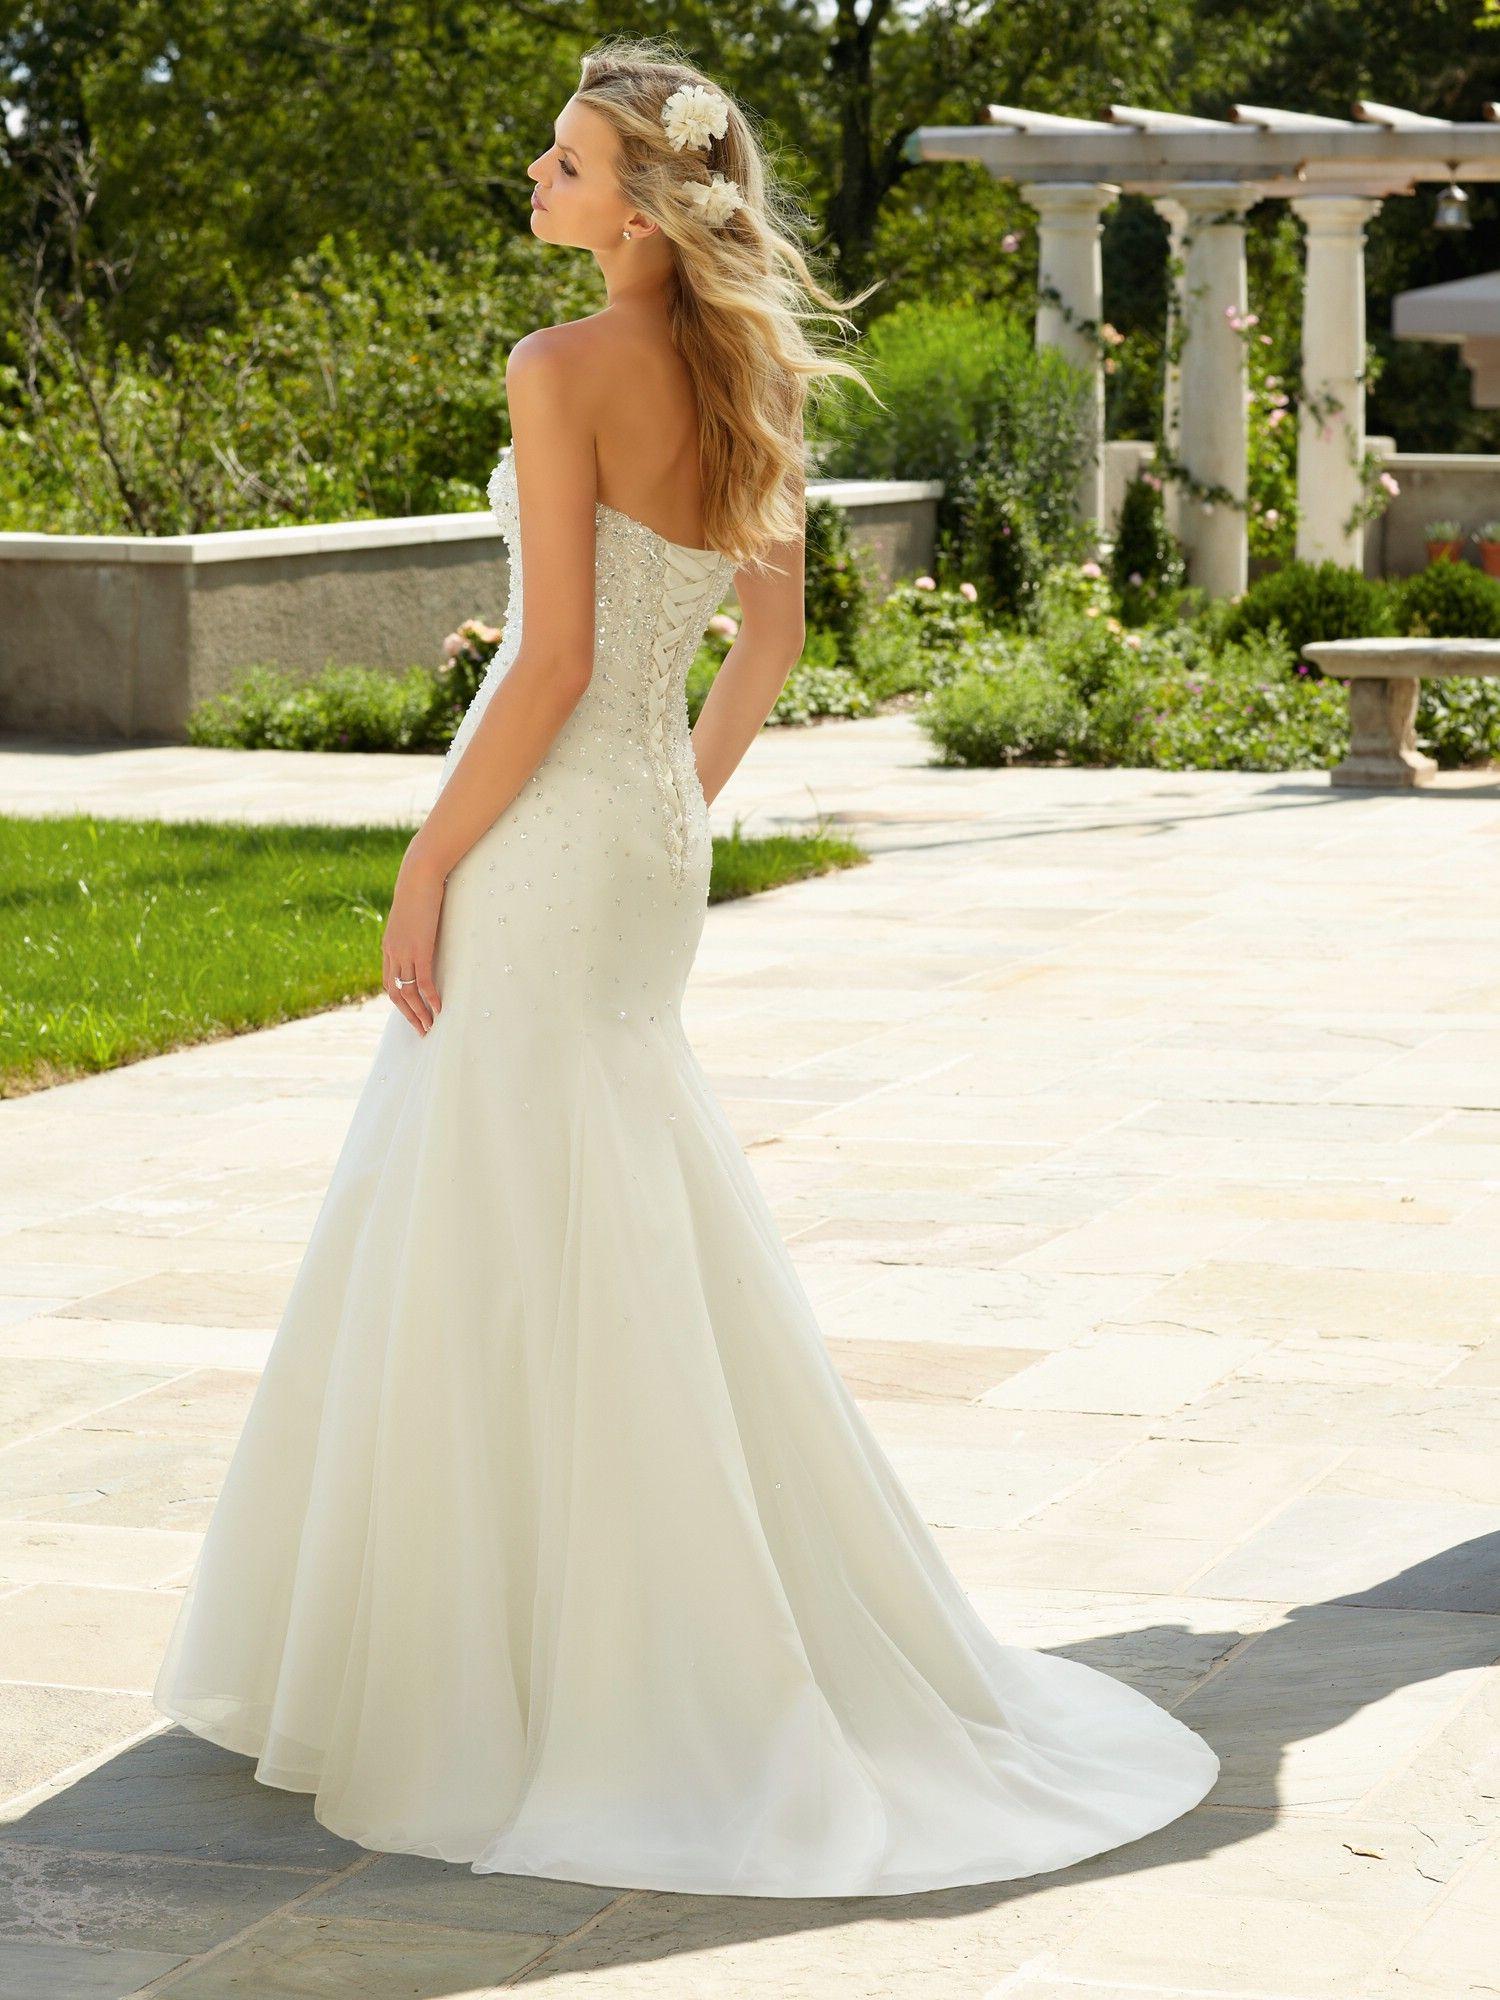 Mori lee wedding dresses style daisy girl dreams